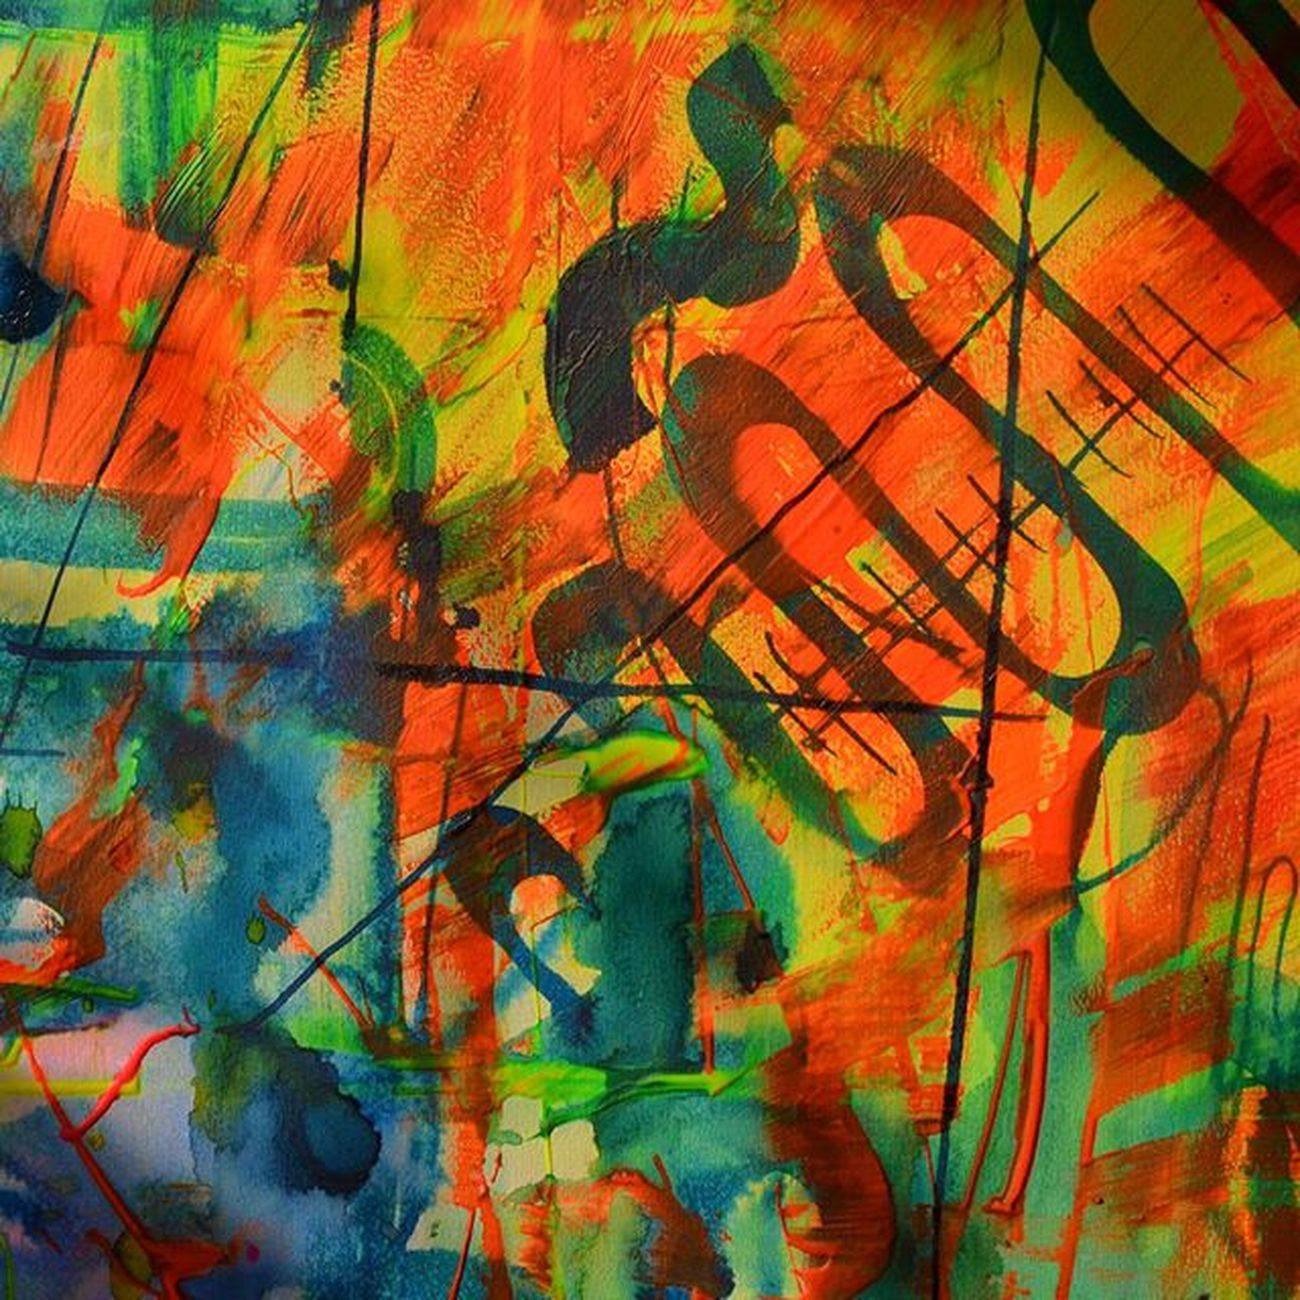 Thebeatles Arminpaulabstract Abstractarts Roylichtenstein Abstractexpressionism Moma Museumofmodernart Modernart Samfrancis Abstractexpressionist Artmuseum Contemporaryart Internationalart Artexhibition Artexhibit Basquiat Abstract Abstractart Abstractartist Abstractarts Abstracted Abstractexpressionism Abstractexpressionist Abstraction Abstractors abstractpaintingerpicassoartbaselwarholoasishrgiger